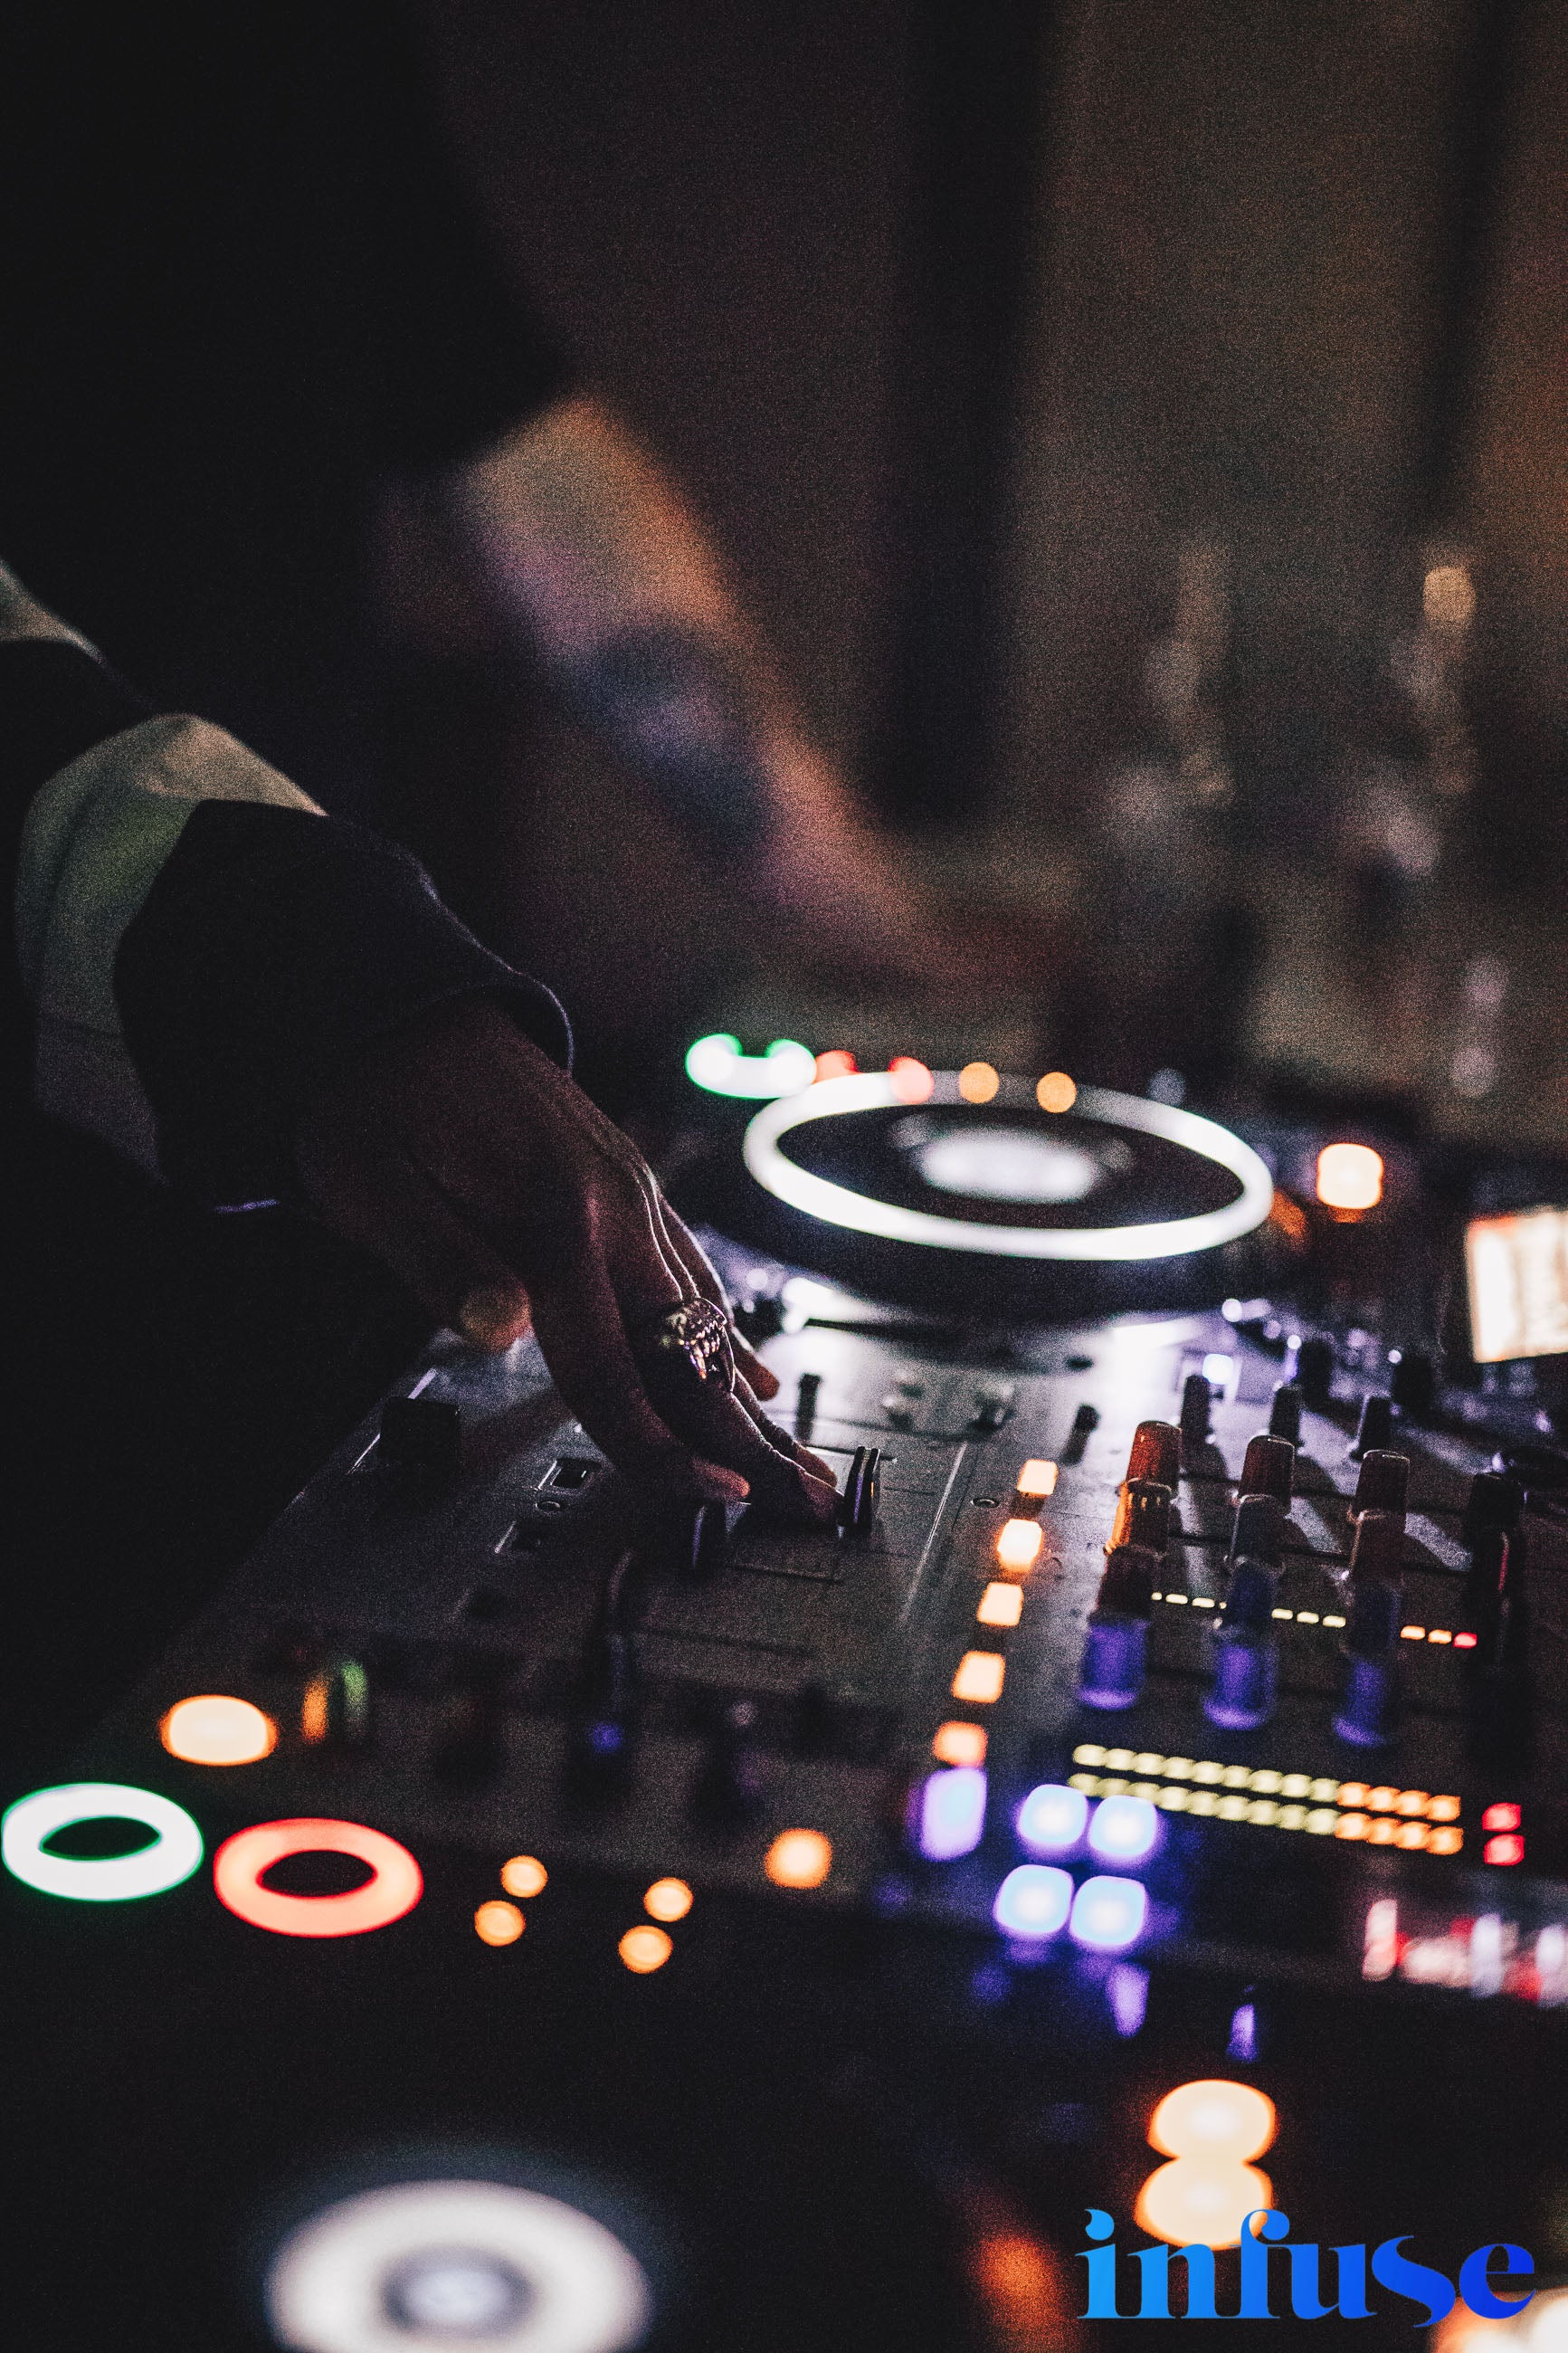 Nastyboys DJ Infuse Fridays - Infuse Nightclub.